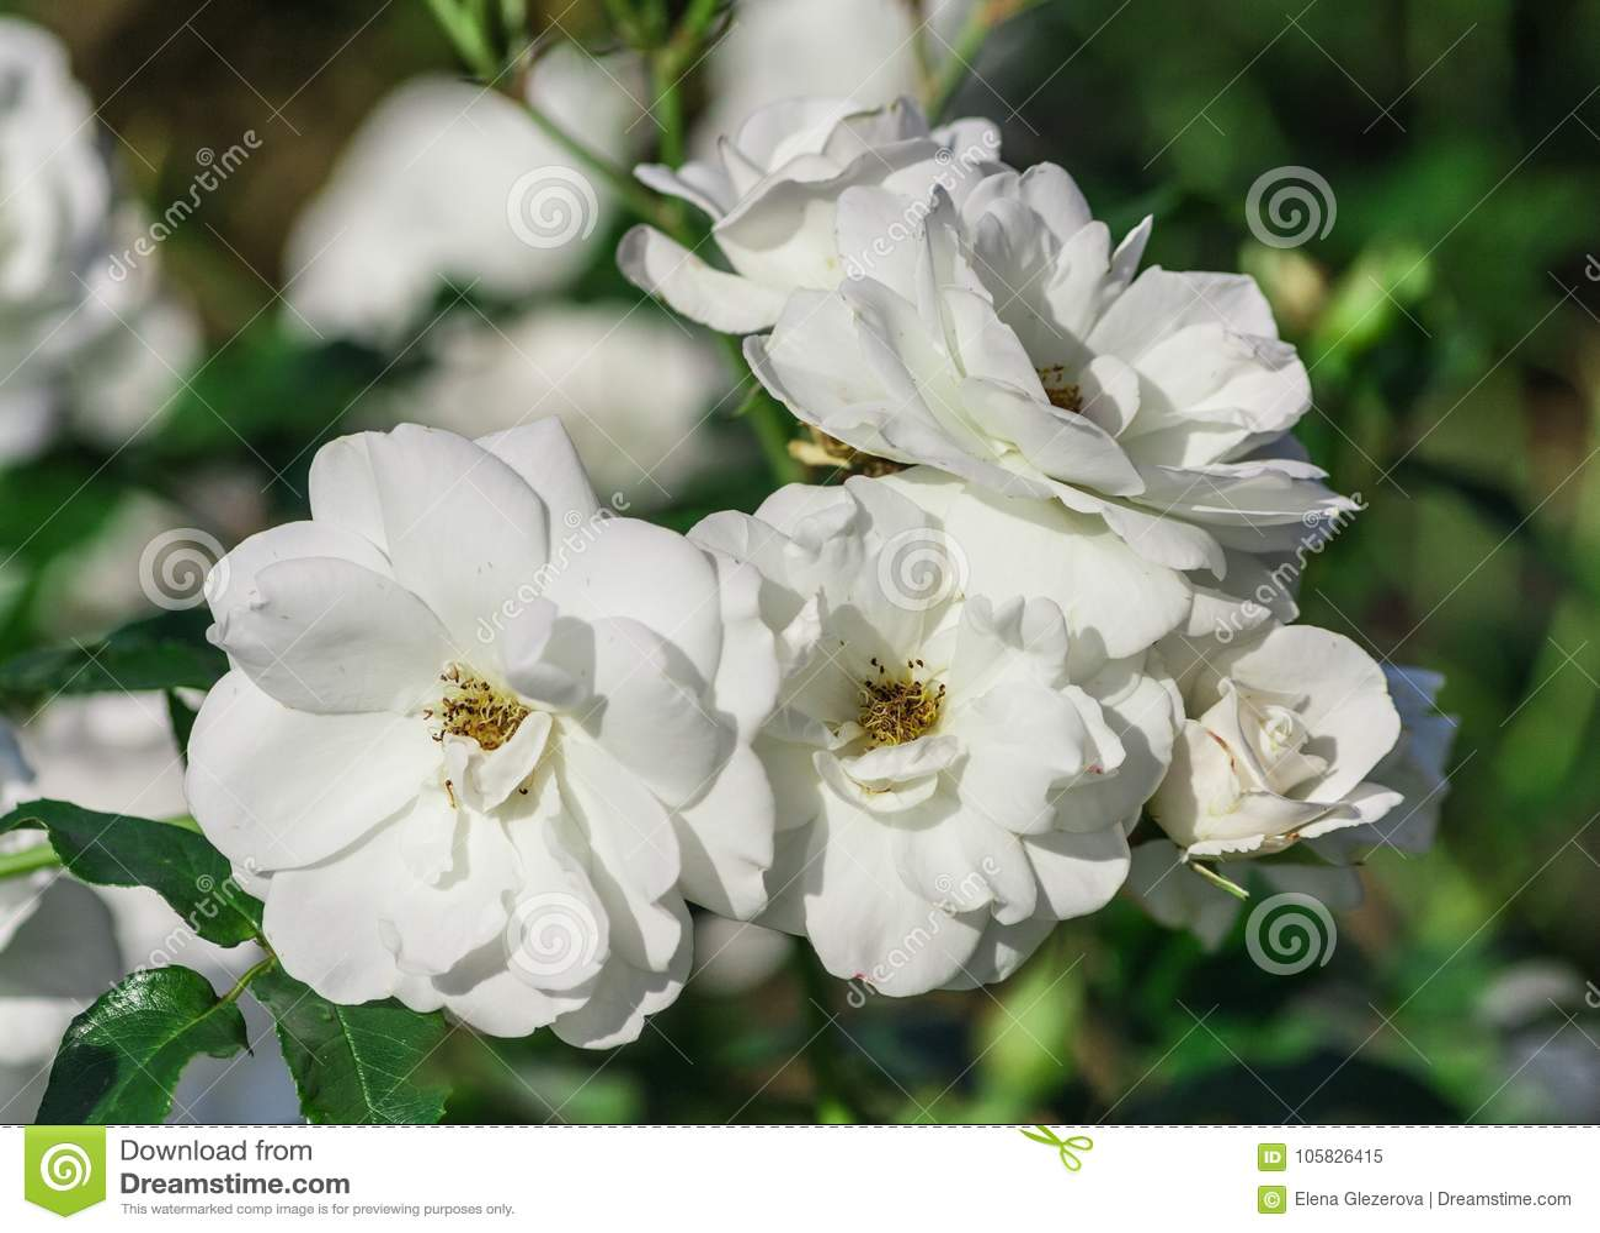 Rose Flower Grade Schneewittchen Iceberg Pure White Flowers Stock